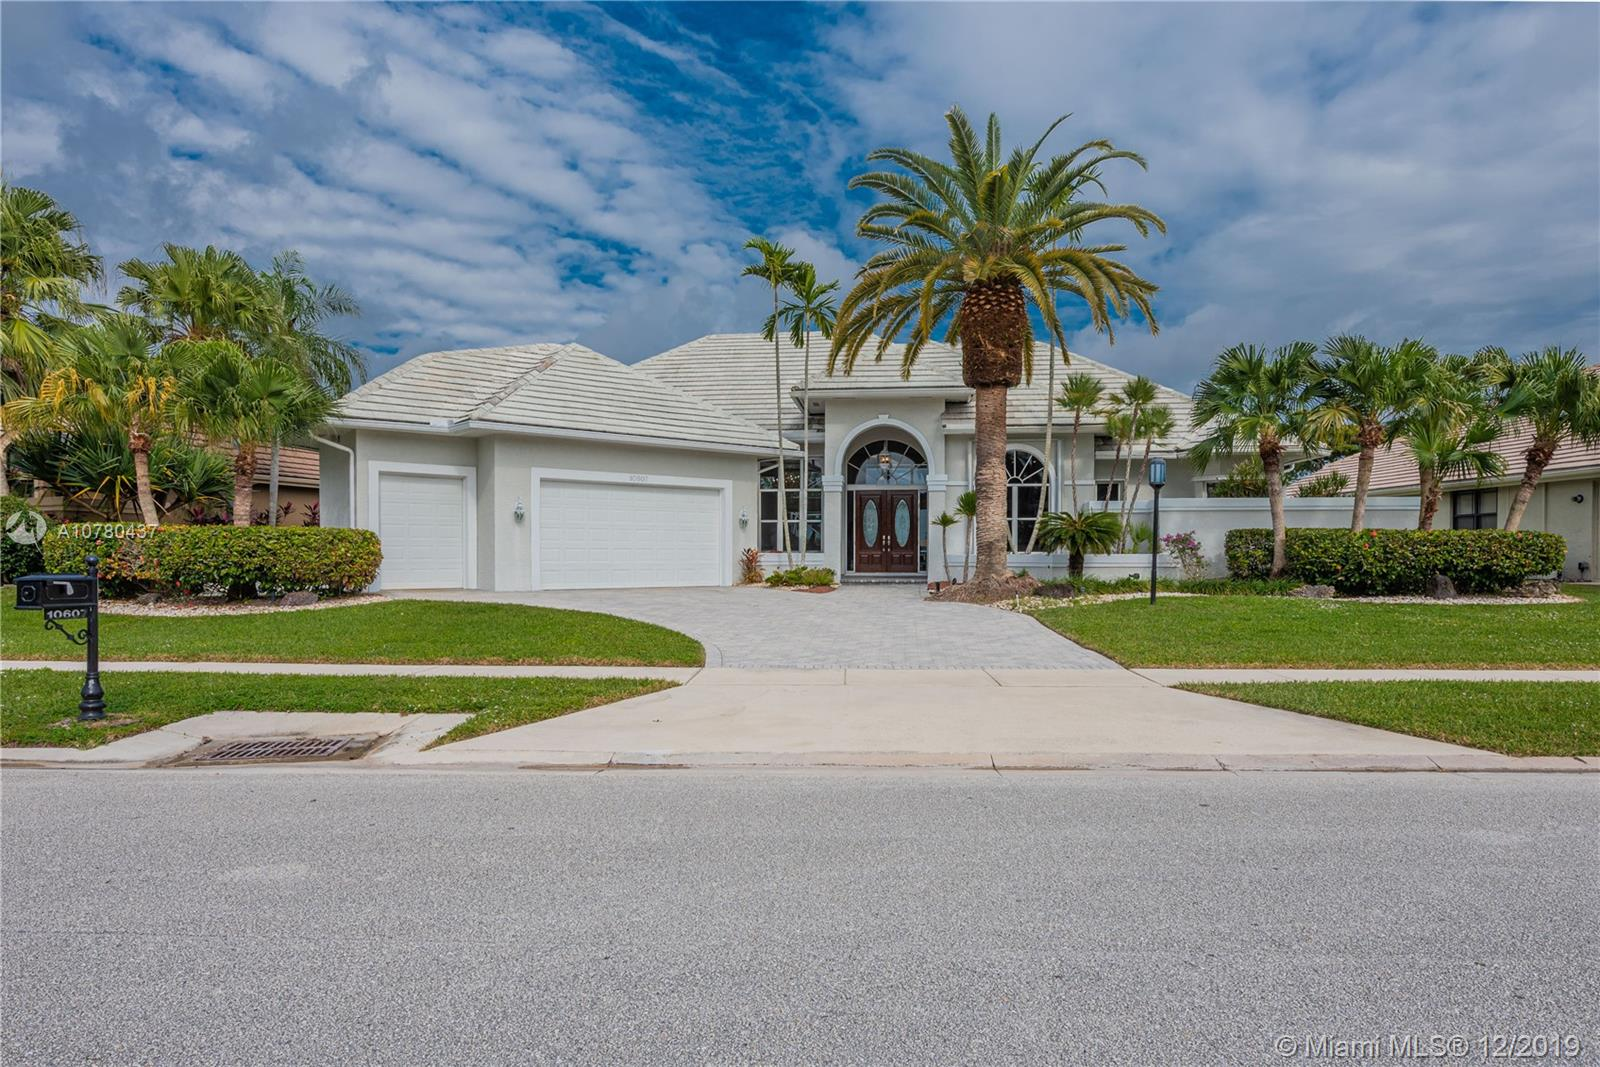 Property for sale at 10607 Stonebridge Blvd, Boca Raton,  Florida 33498